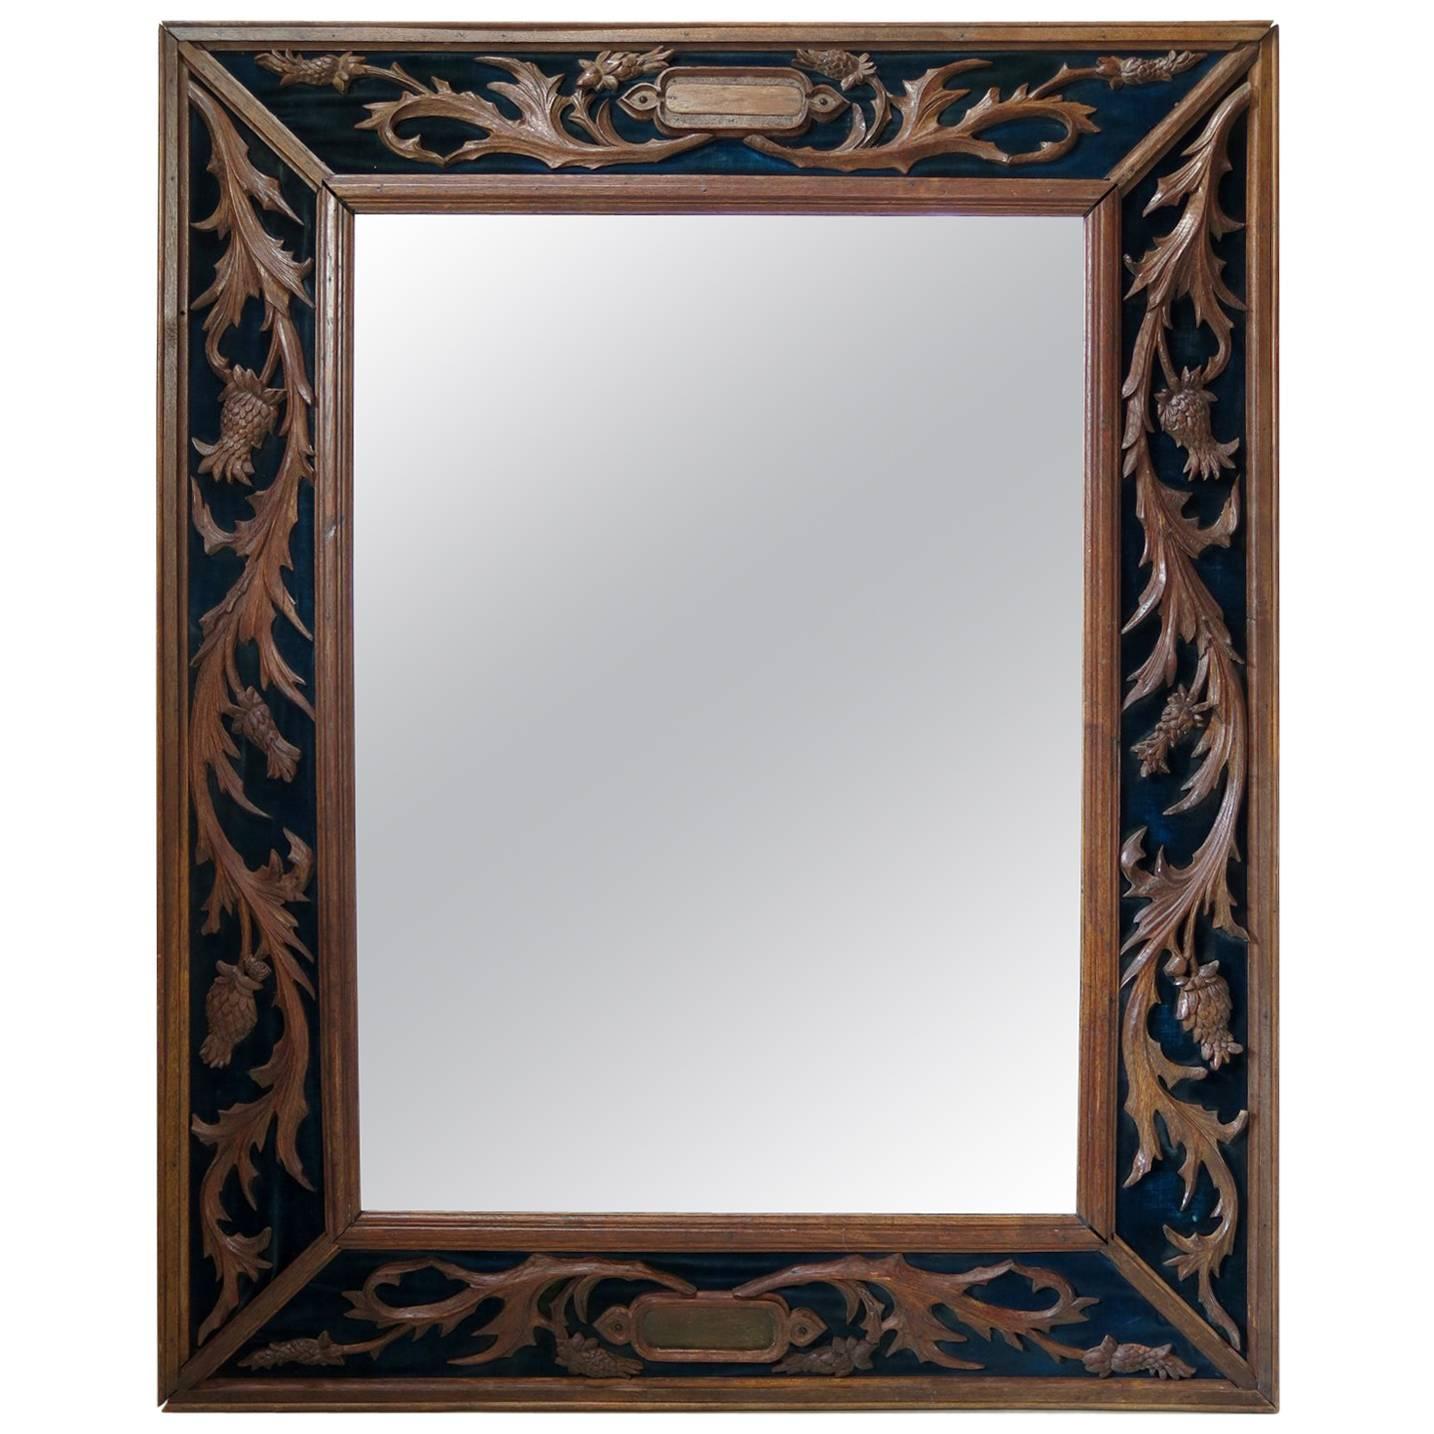 Carved Napoleon III Oak and Velvet Mirror, France, 19th Century